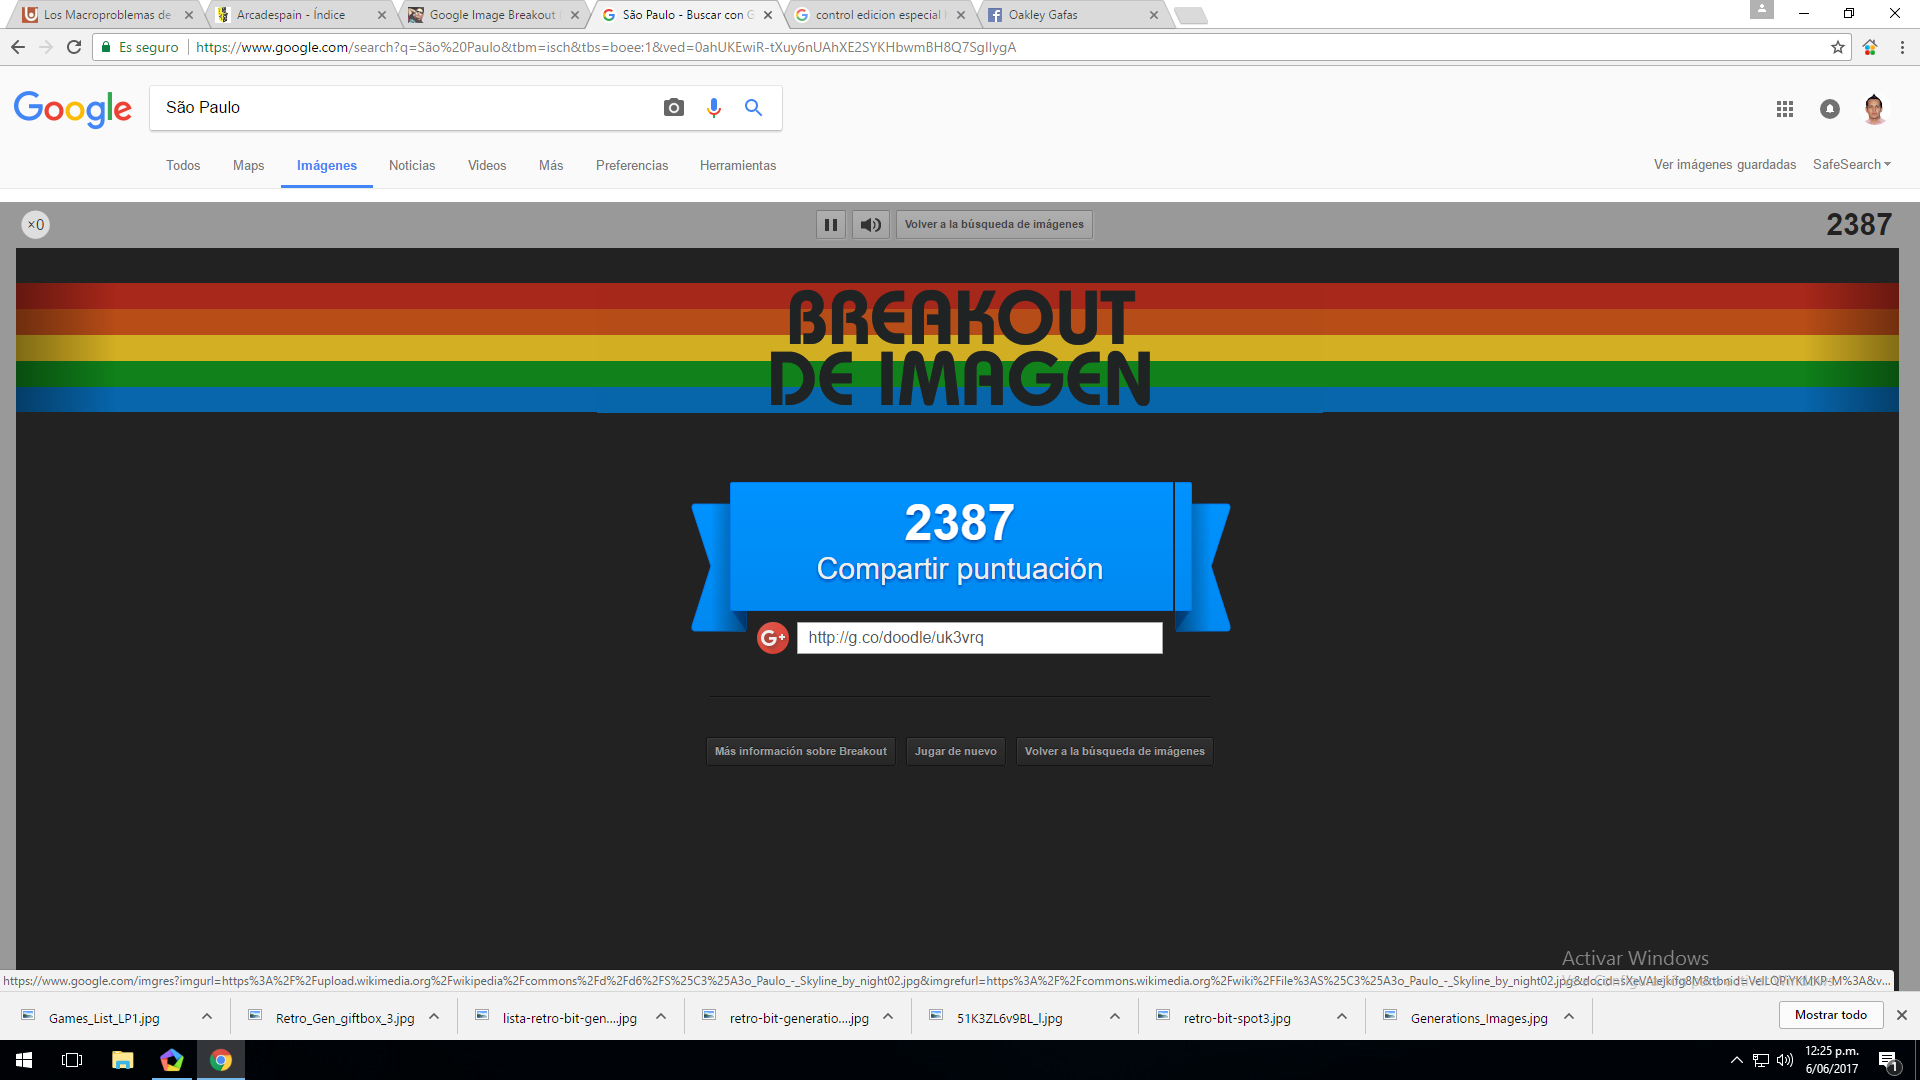 Google Image Breakout 2,387 points